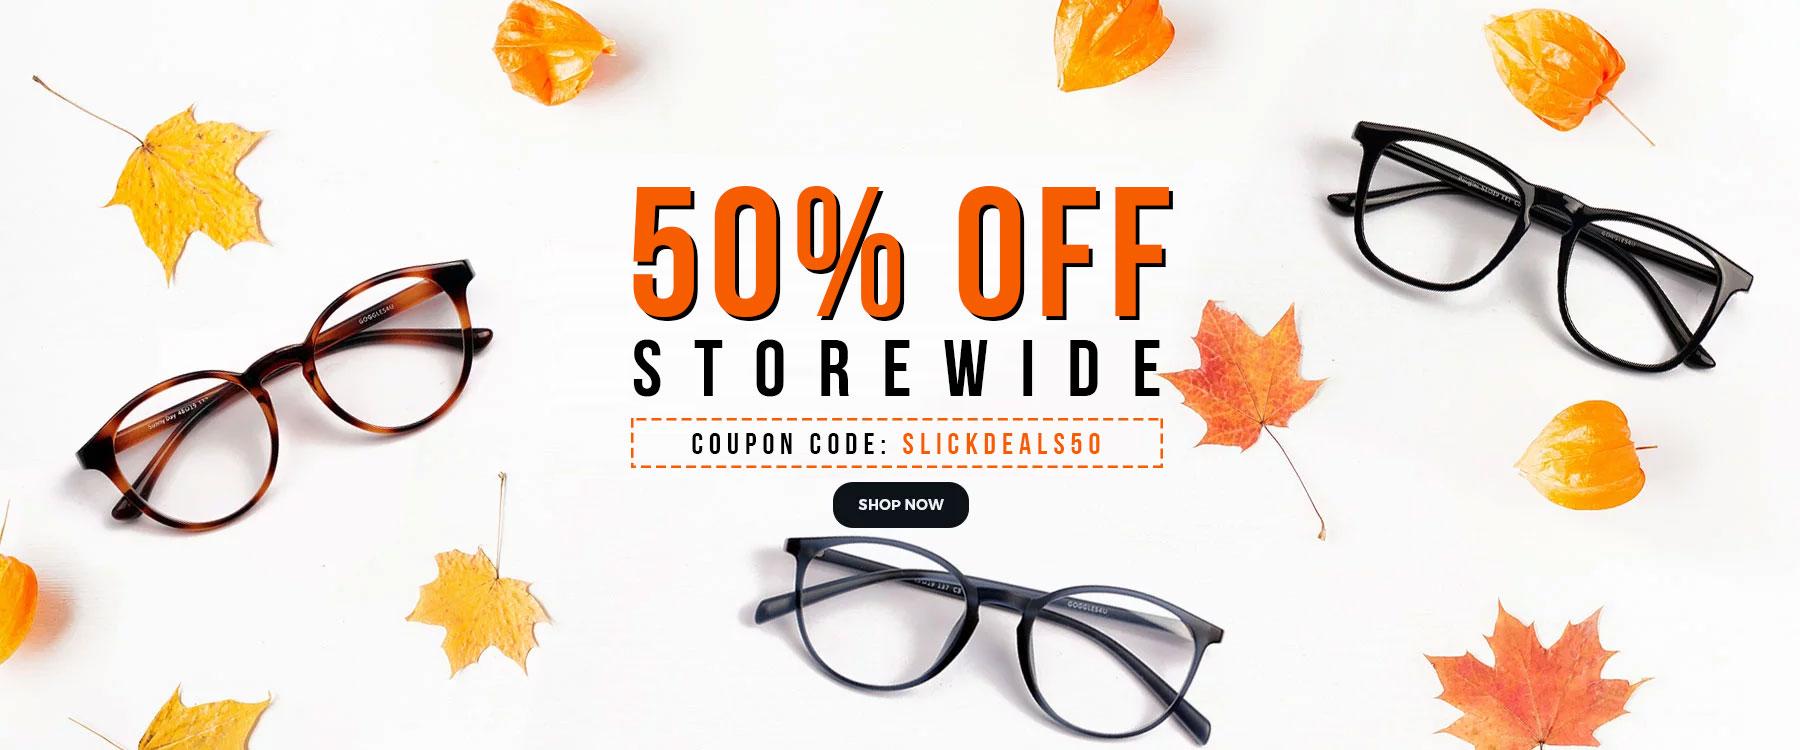 384fdf13ac 50% OFF on Prescription Eyeglasses   Sunglasses by Goggles4u ...